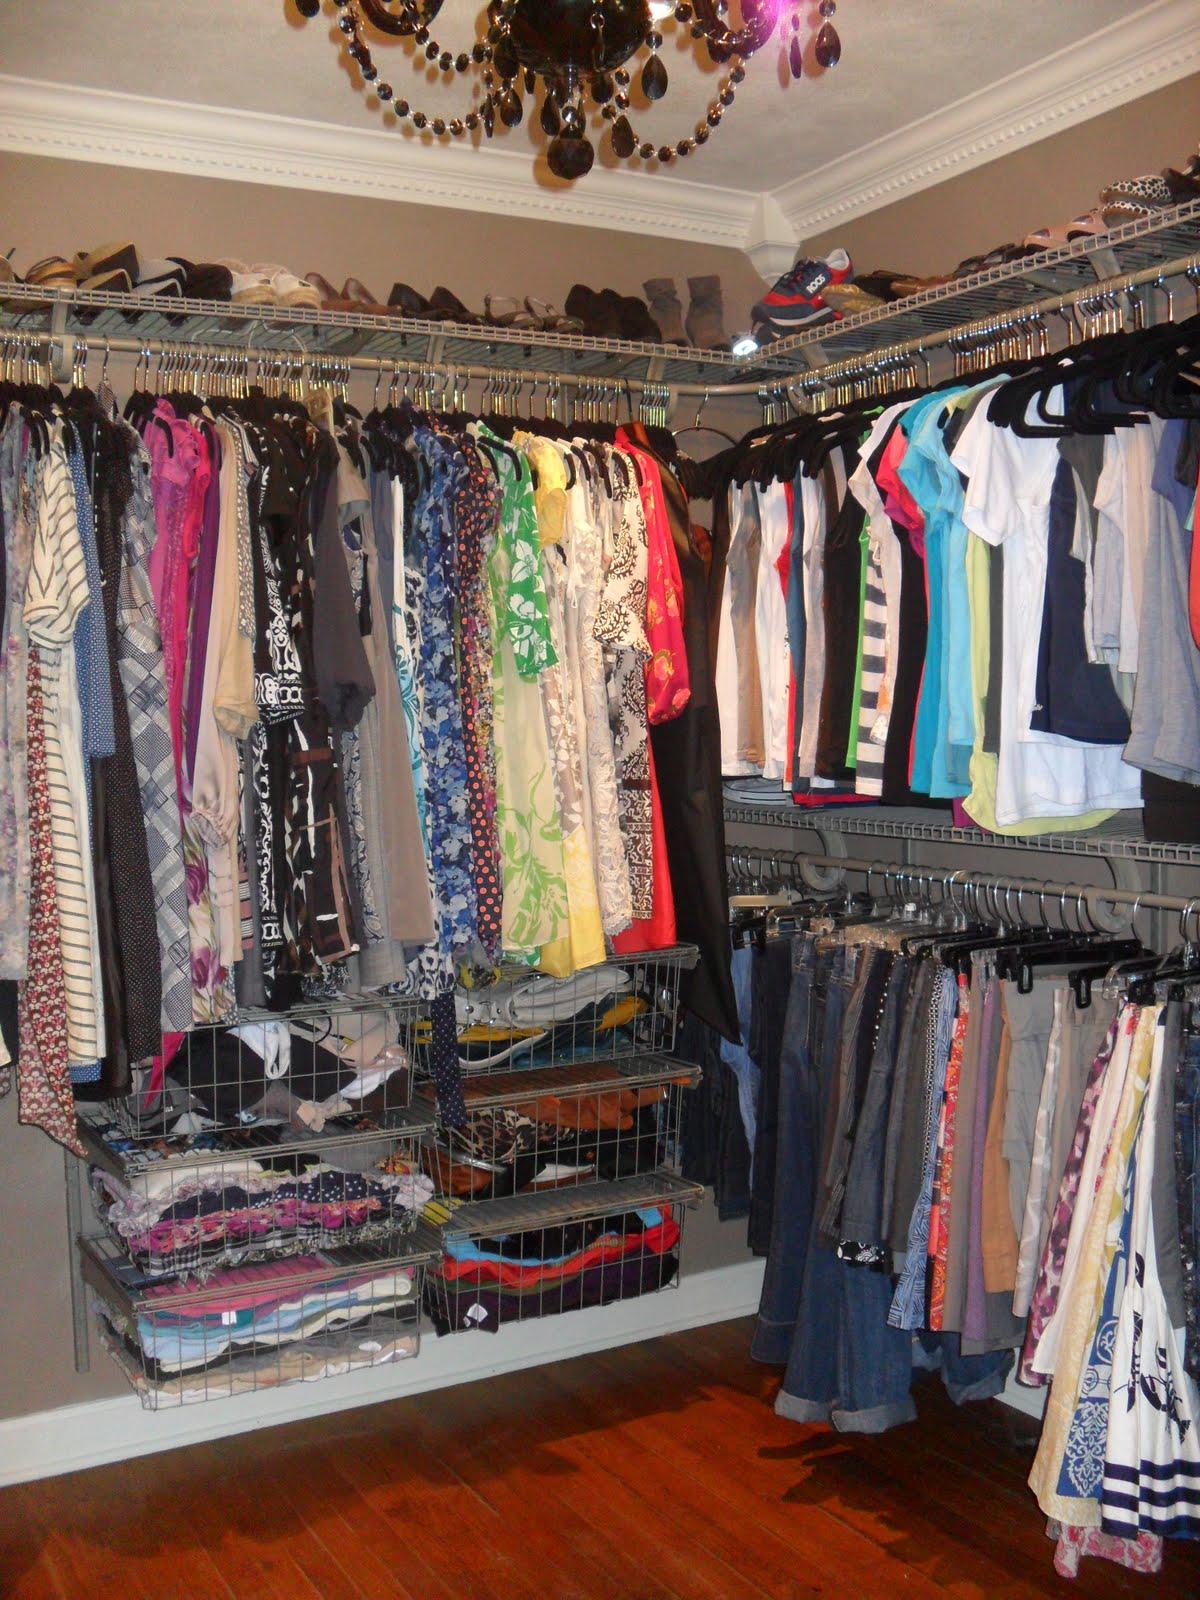 Petite Early Morning Style: DIY Walk-In-Closet Renovation